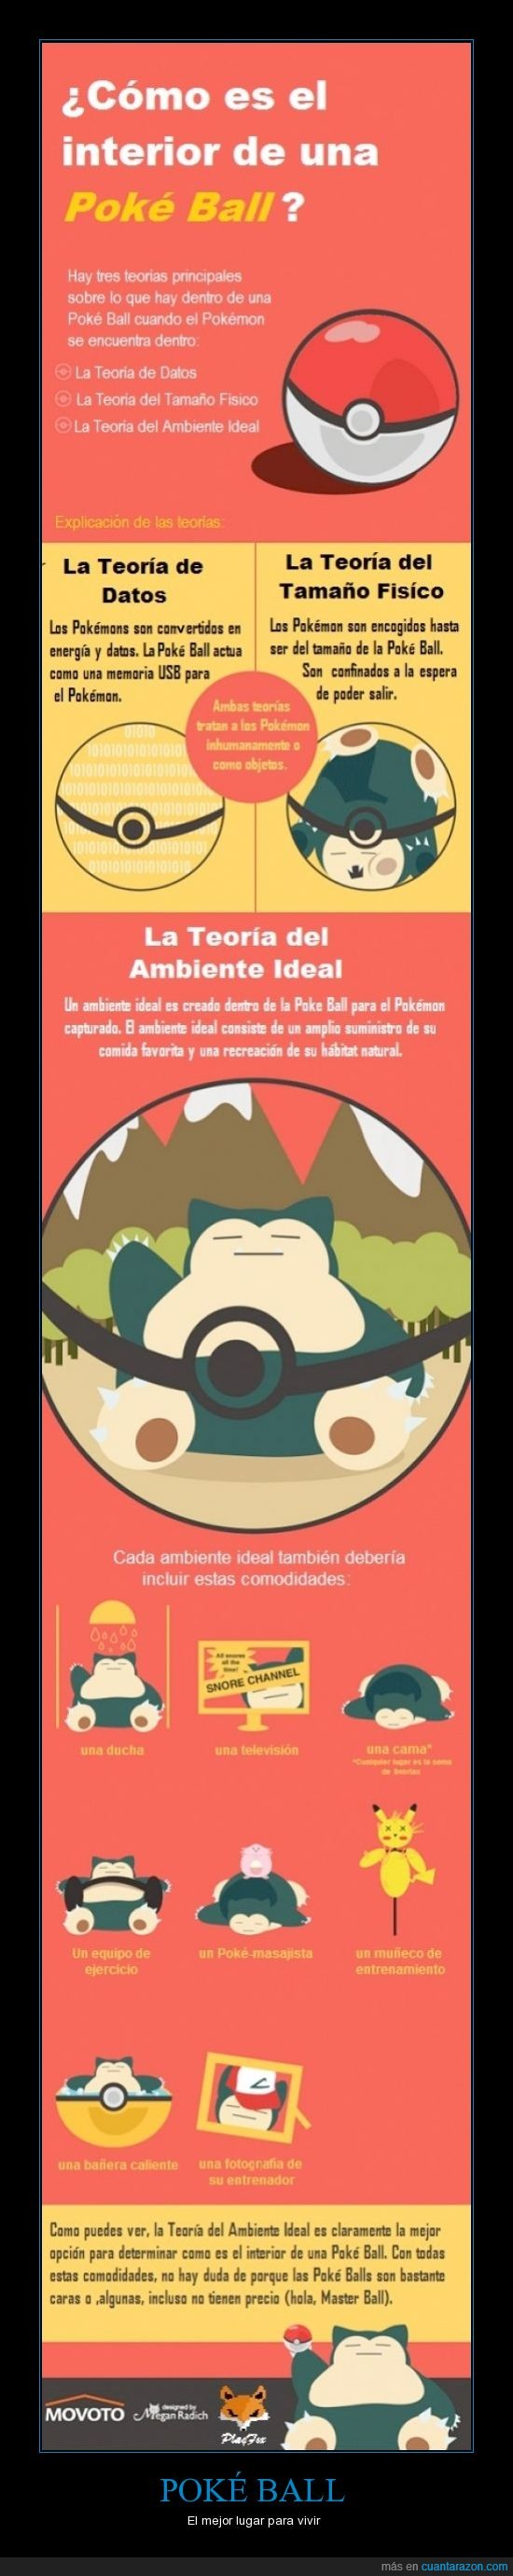 habitat ideal,PokéBall,Pokémon,teorias